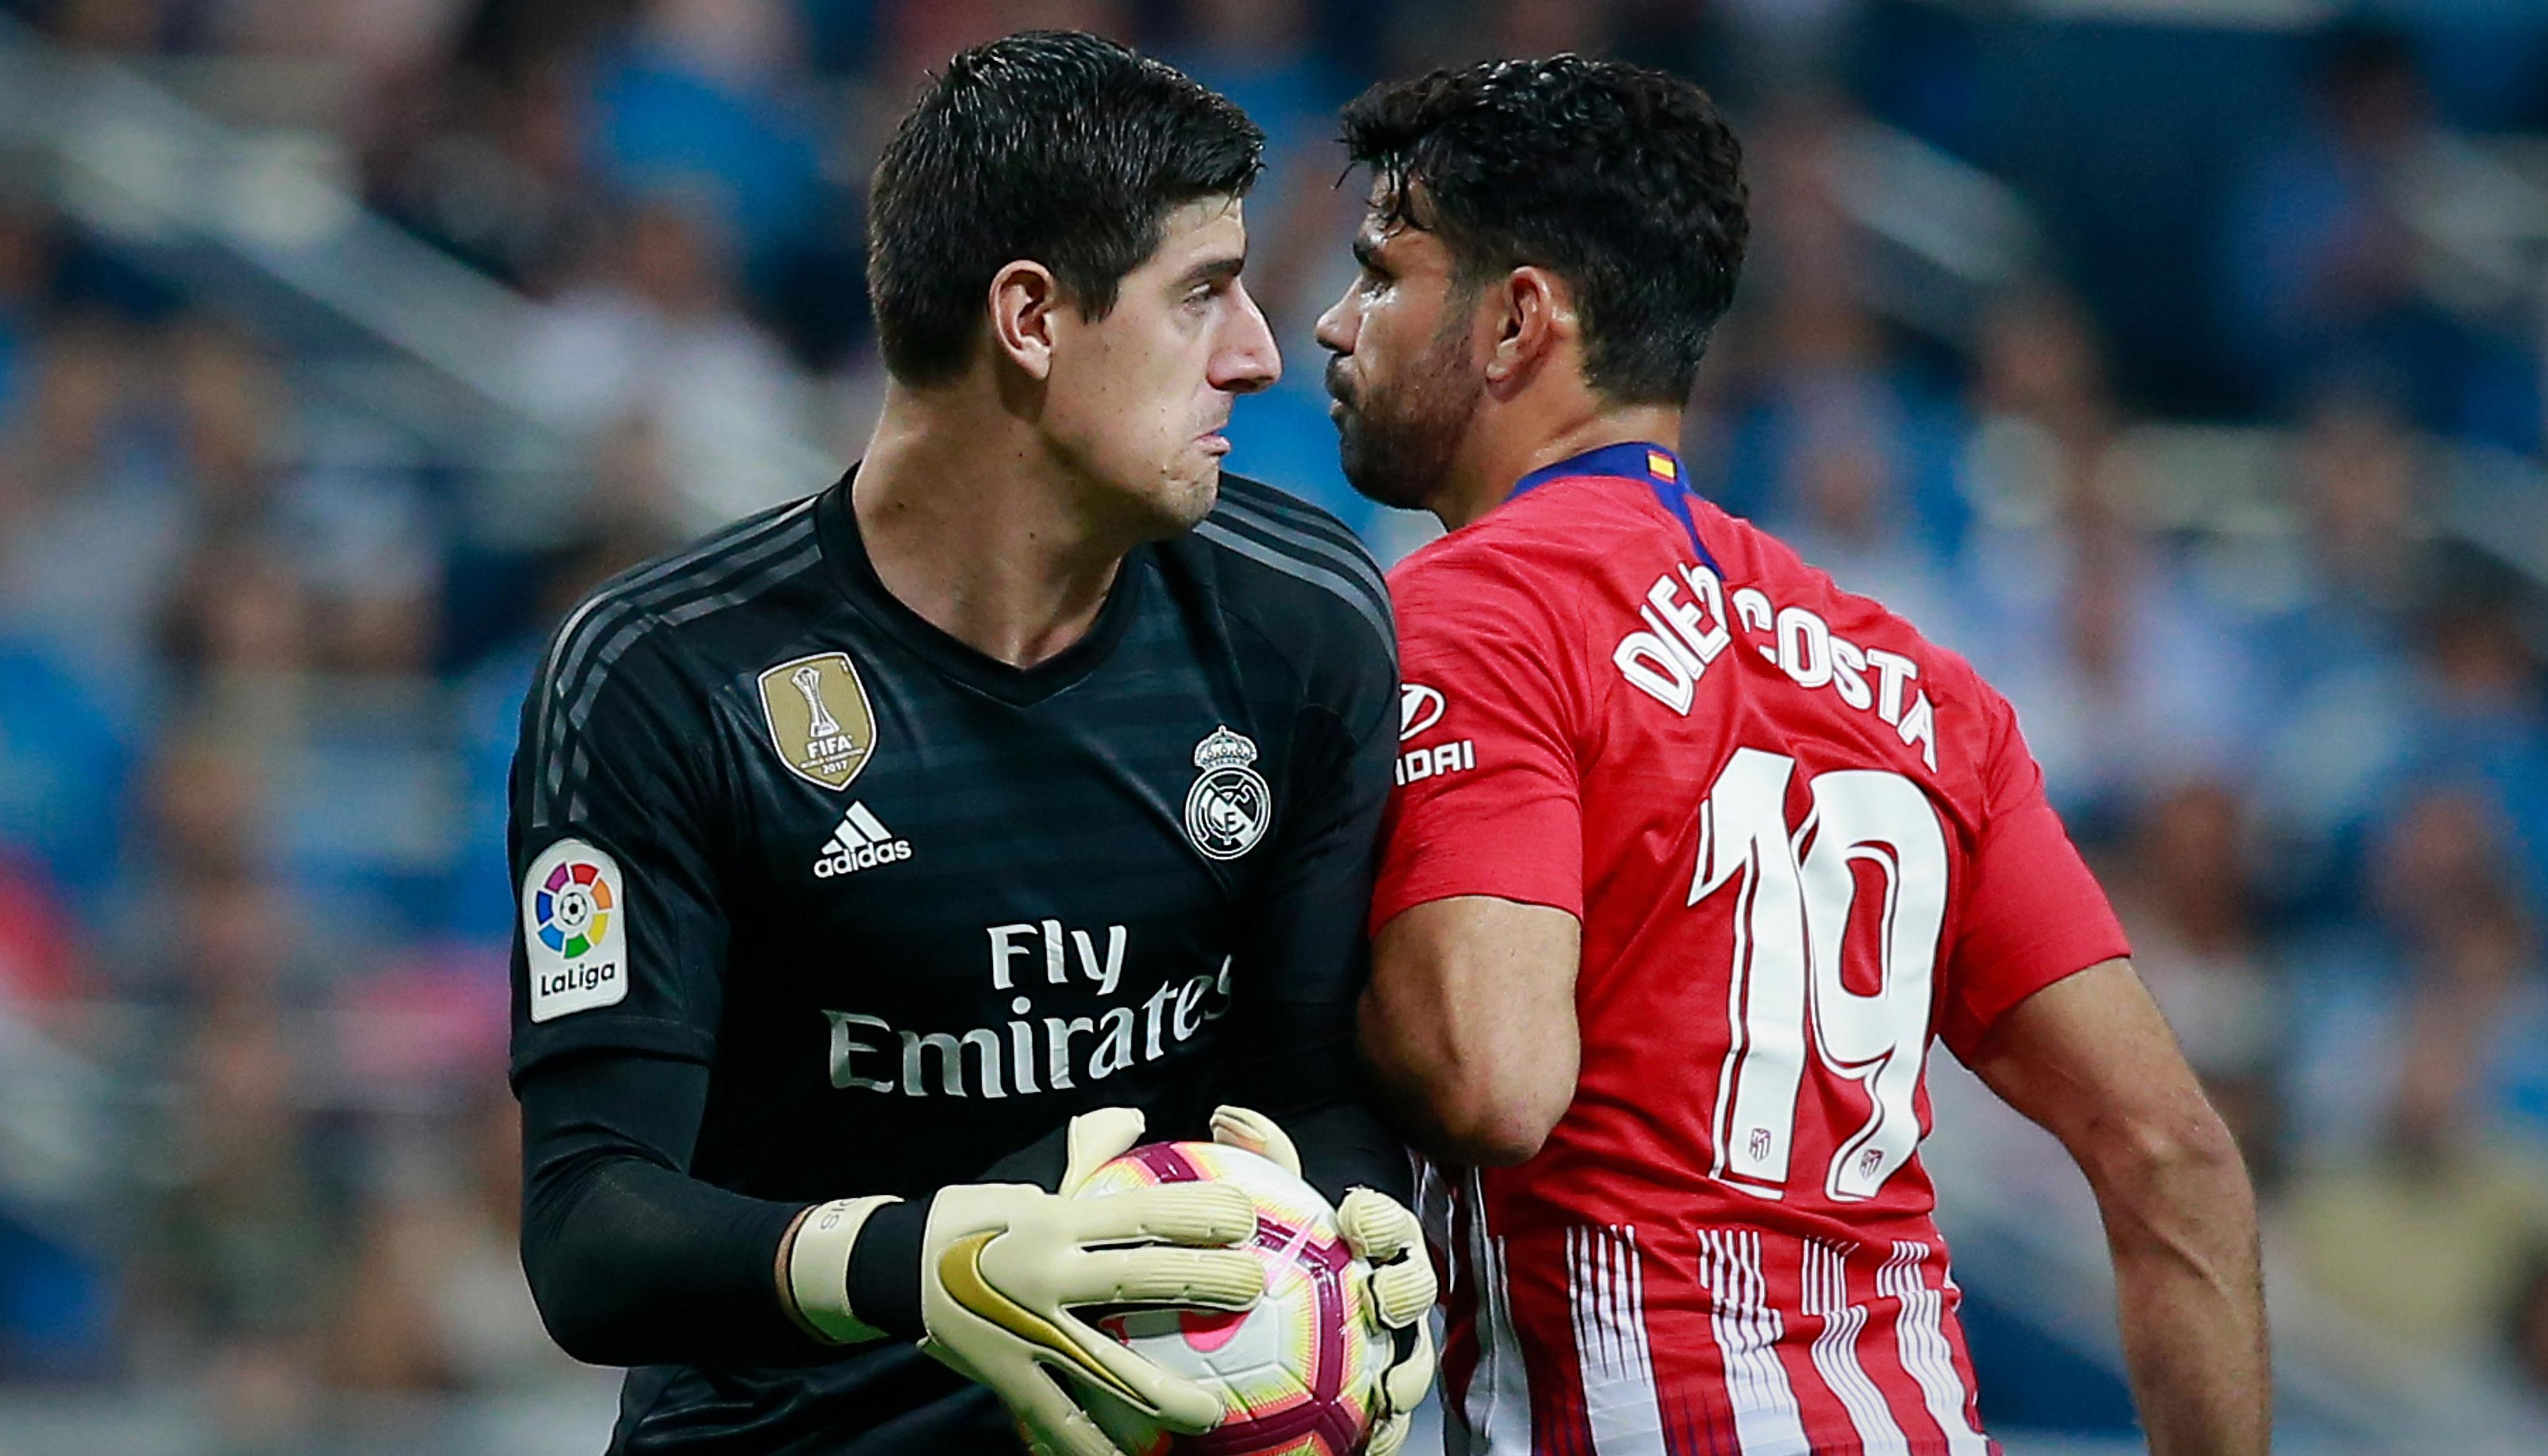 Atletico Madrid vs Real Madrid: City rivals hard to split